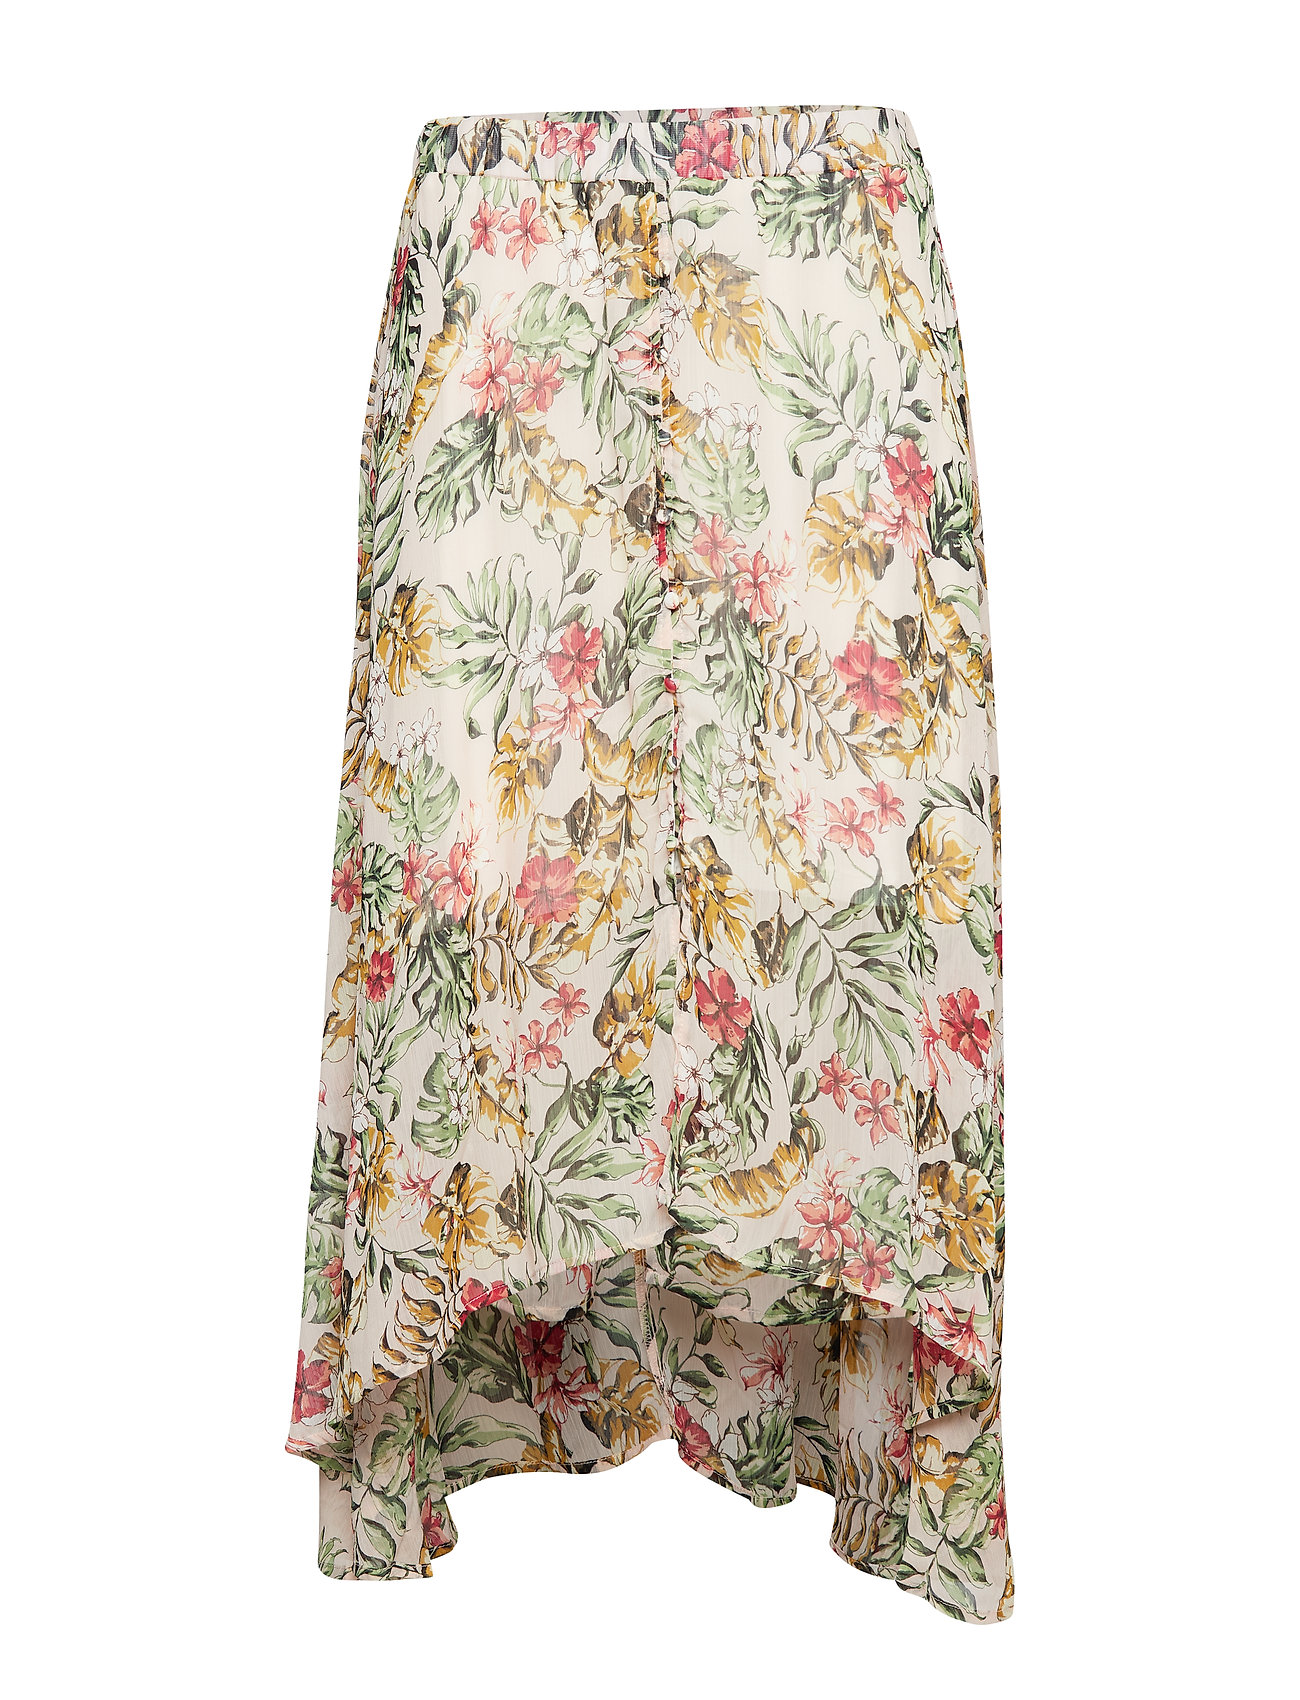 7370678d3b34 Elodie Skirt (Pink Champagne) (639.20 kr) - Cream - | Boozt.com